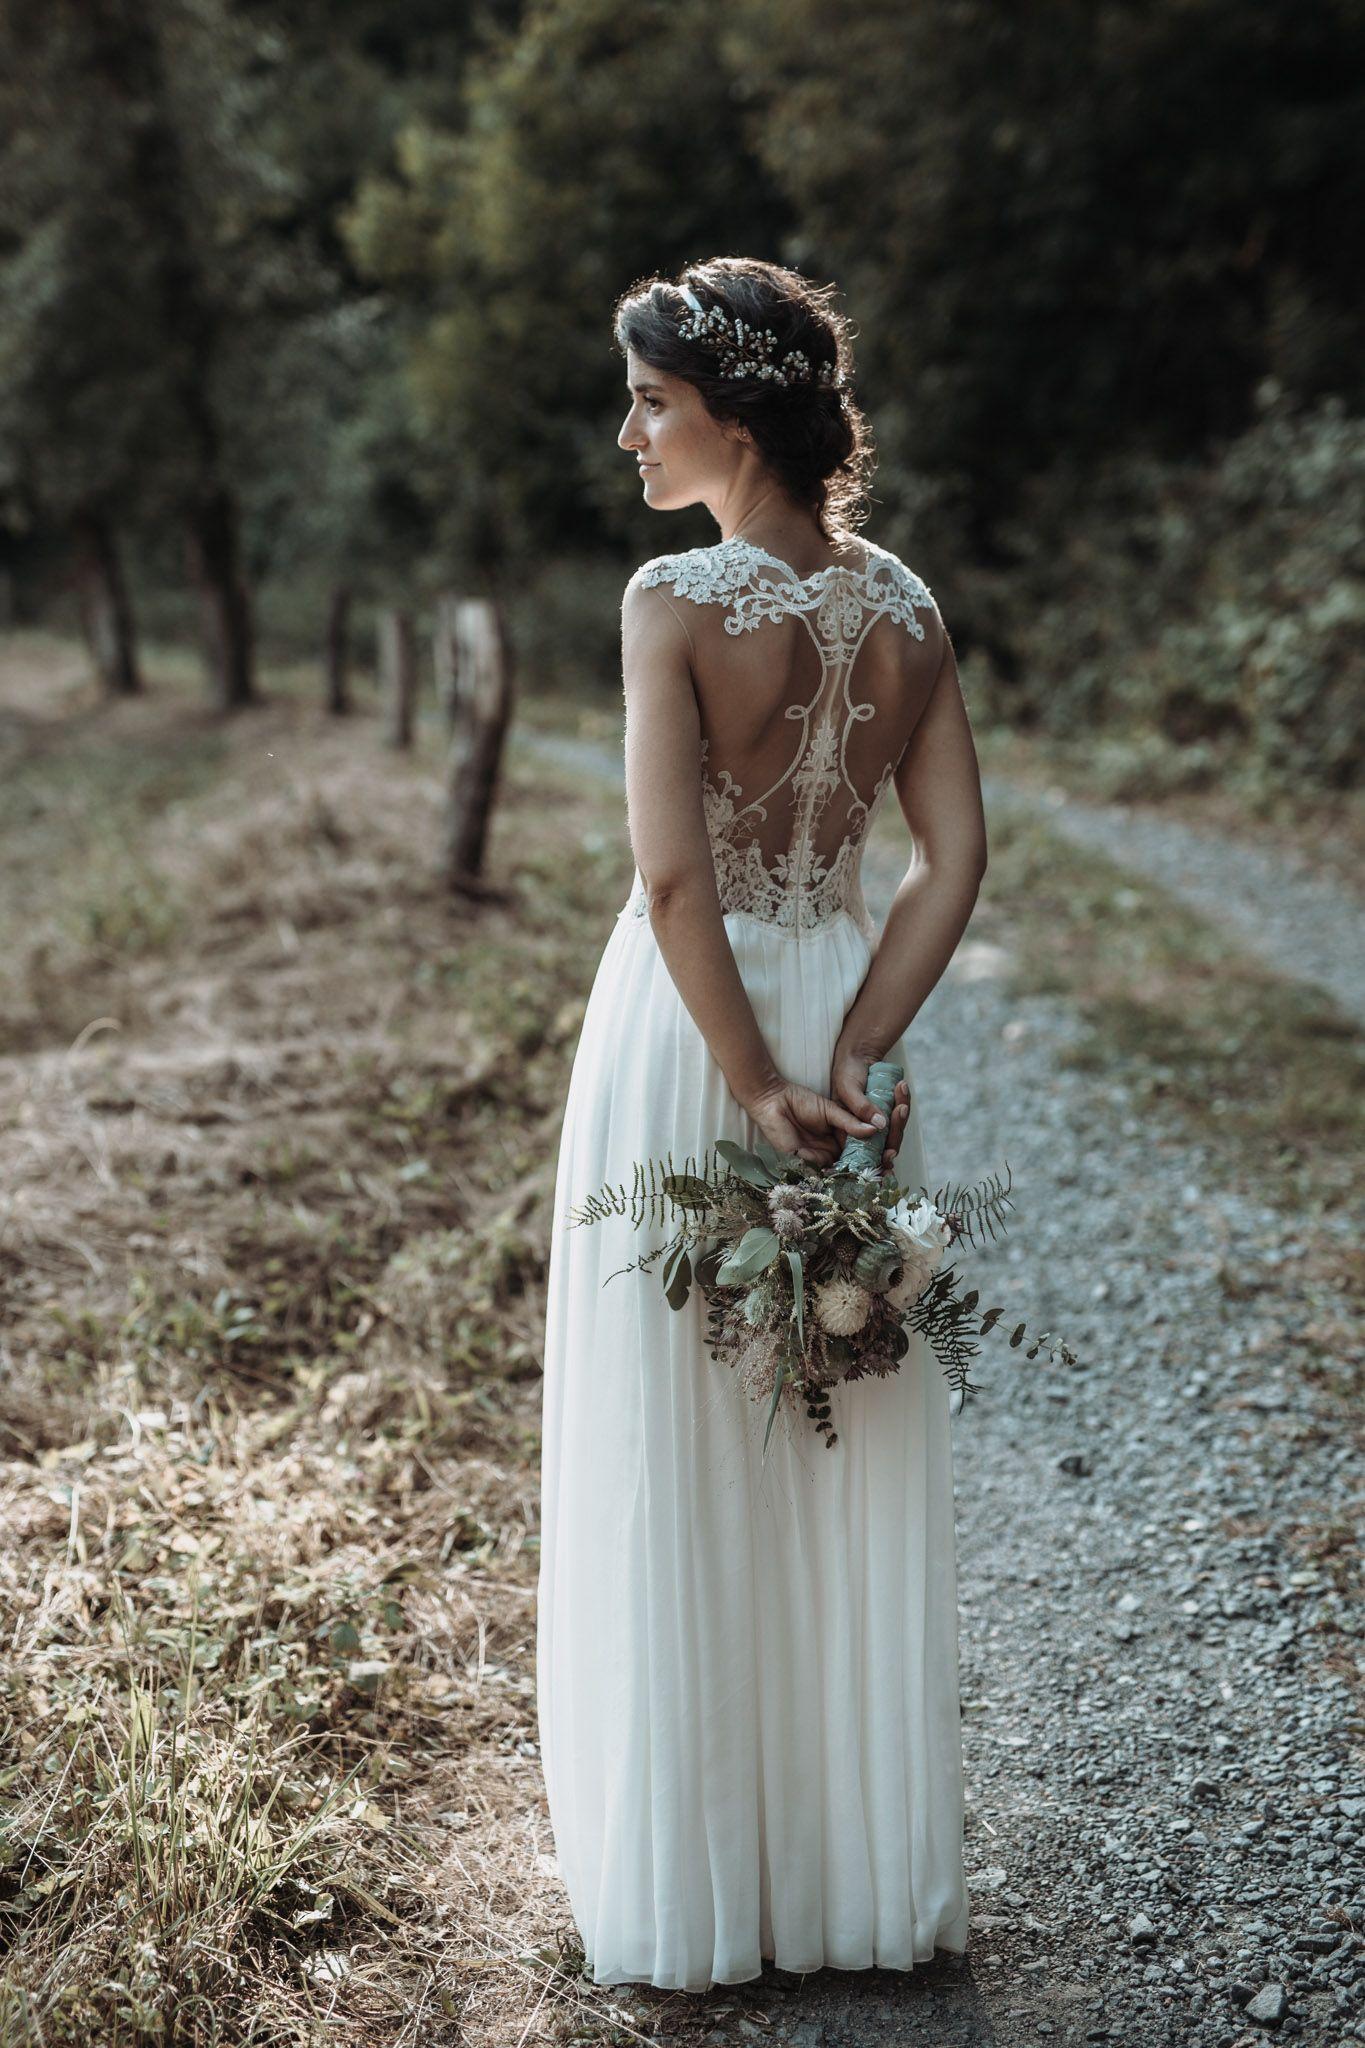 #vintagesuitcasewedding